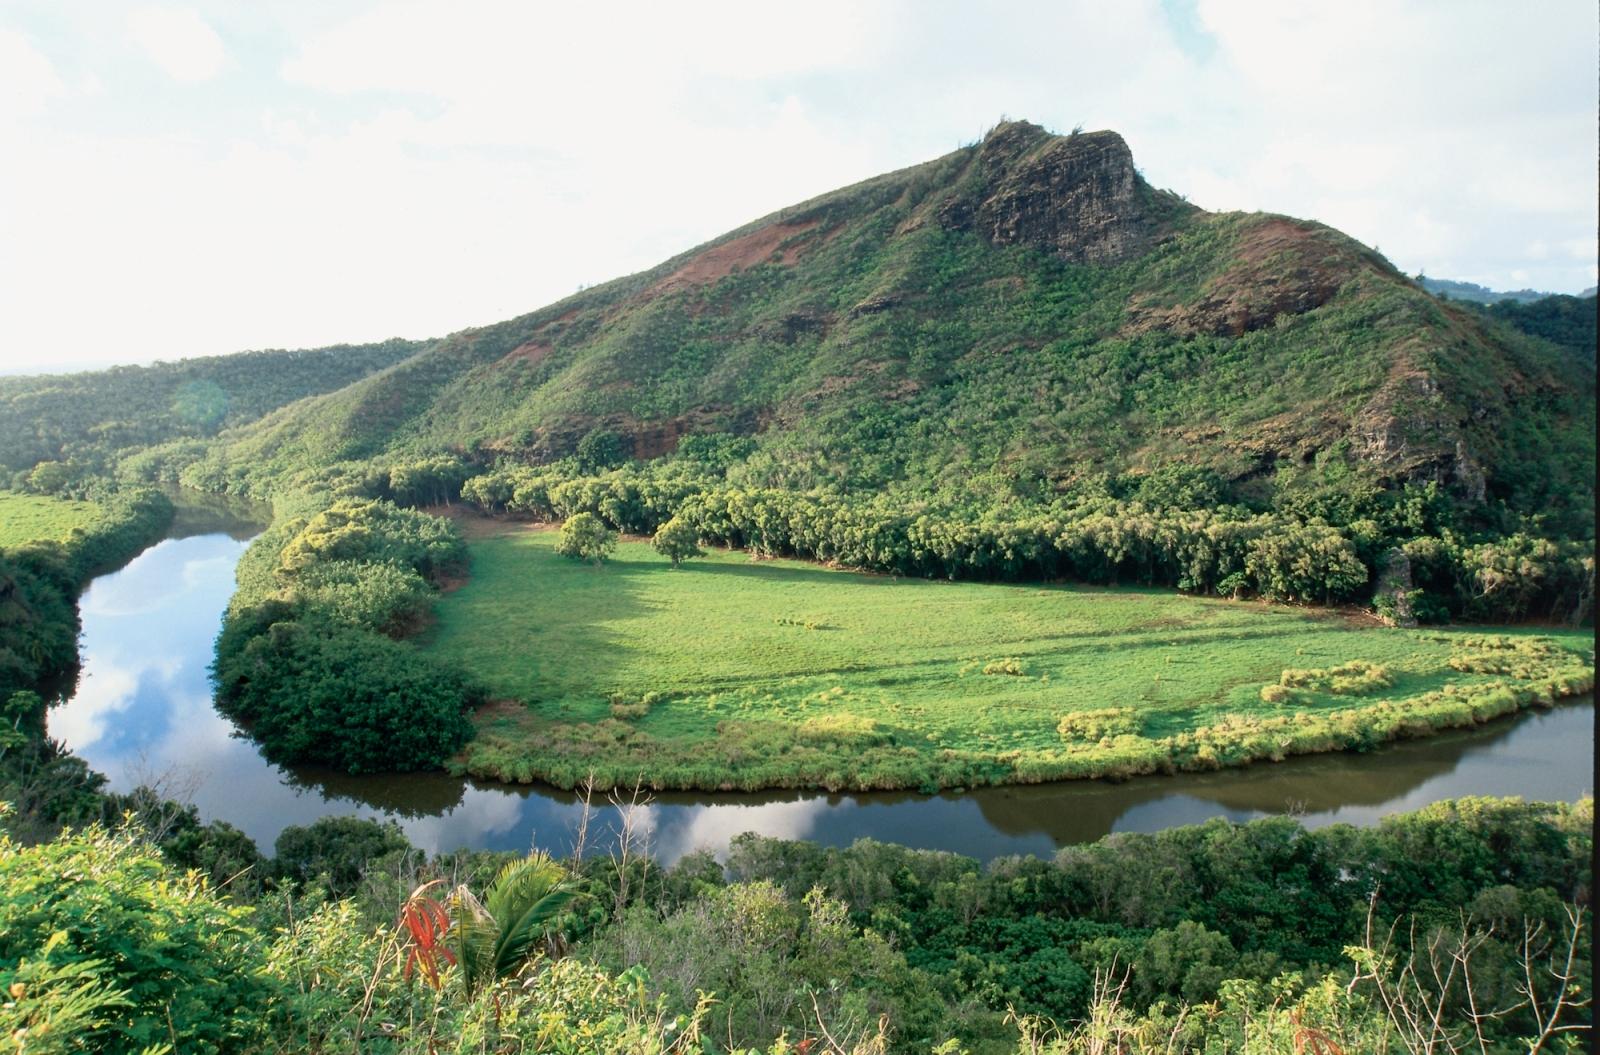 Hawaii Tourism Authority (HTA) / Robert Coello